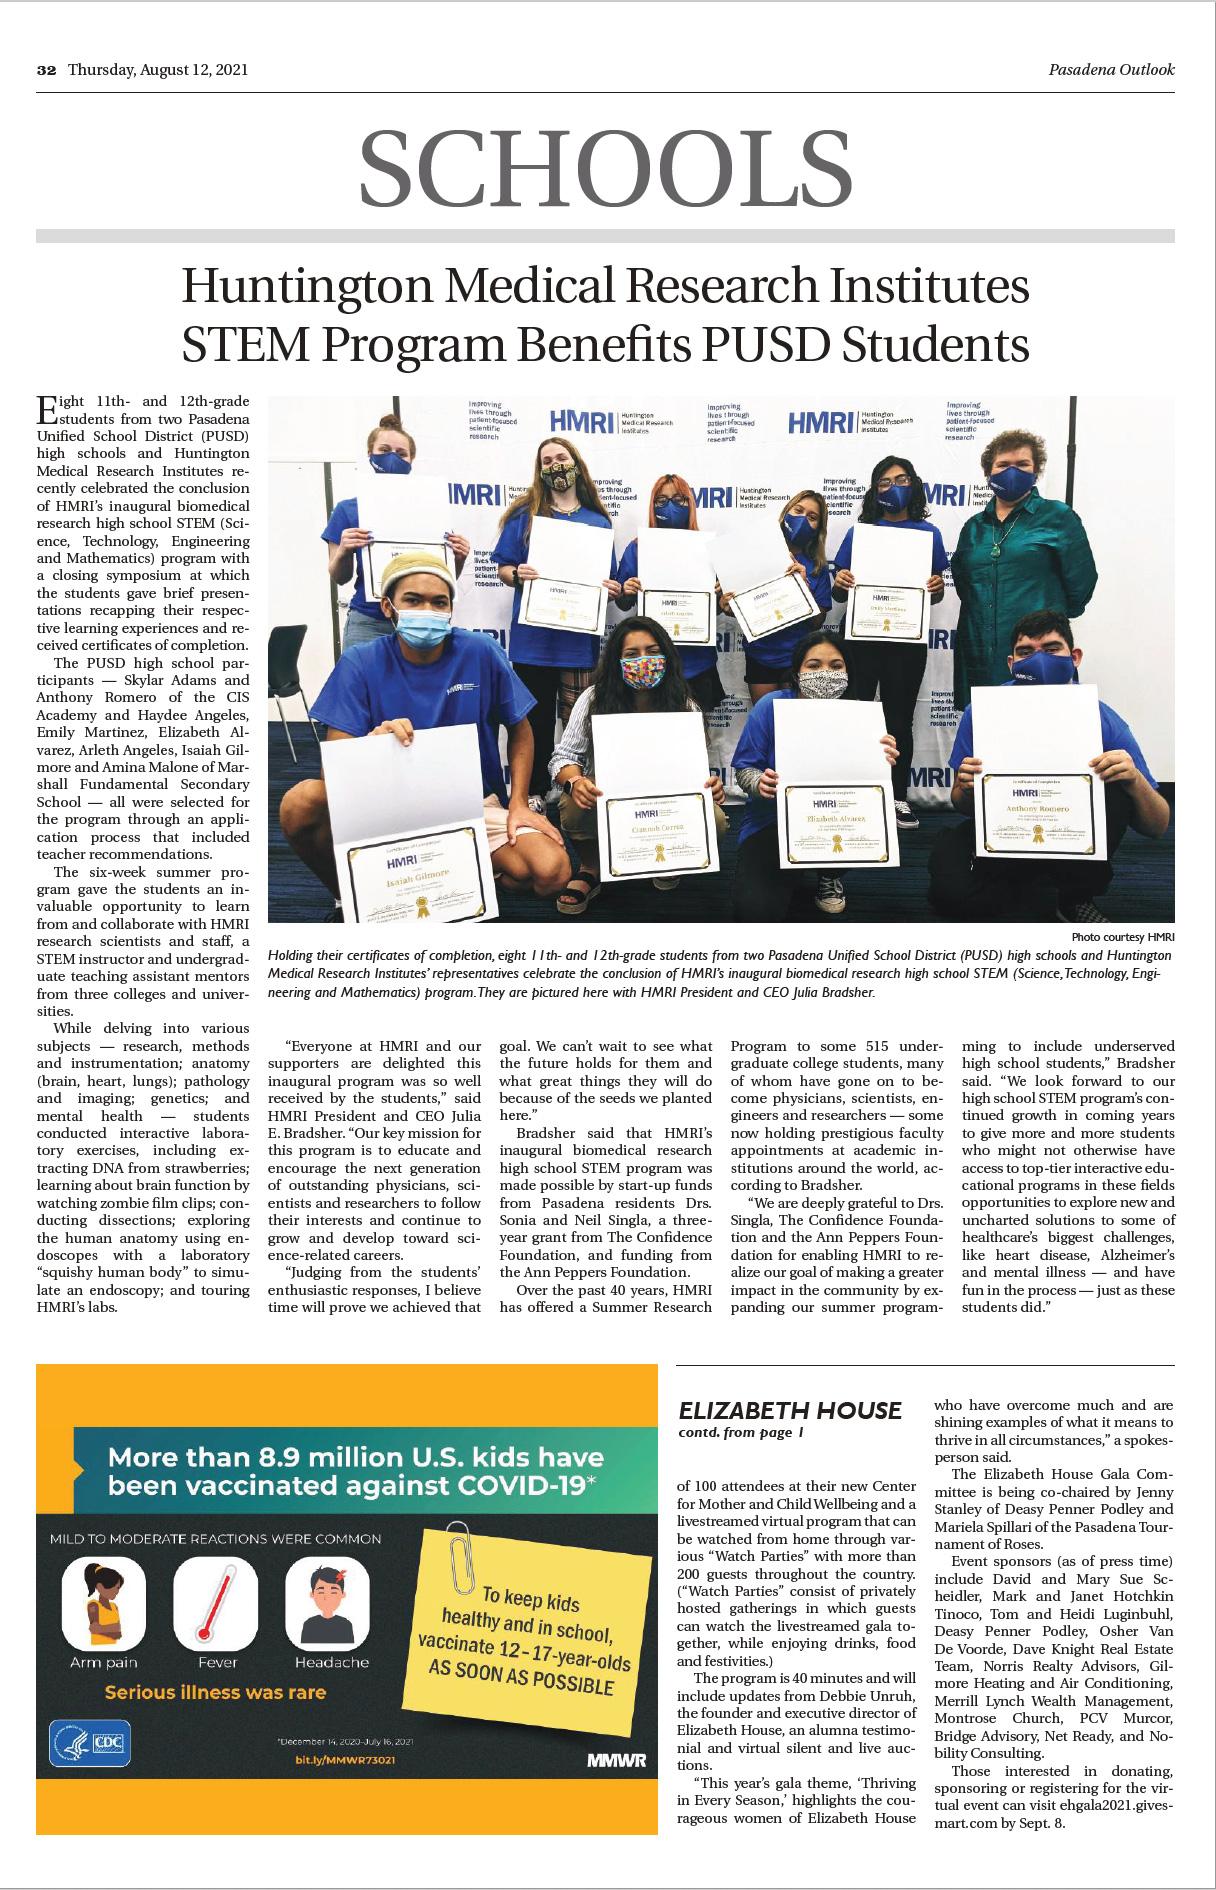 Huntington Medical Research Institutes STEM Program Benefits PUSD Students